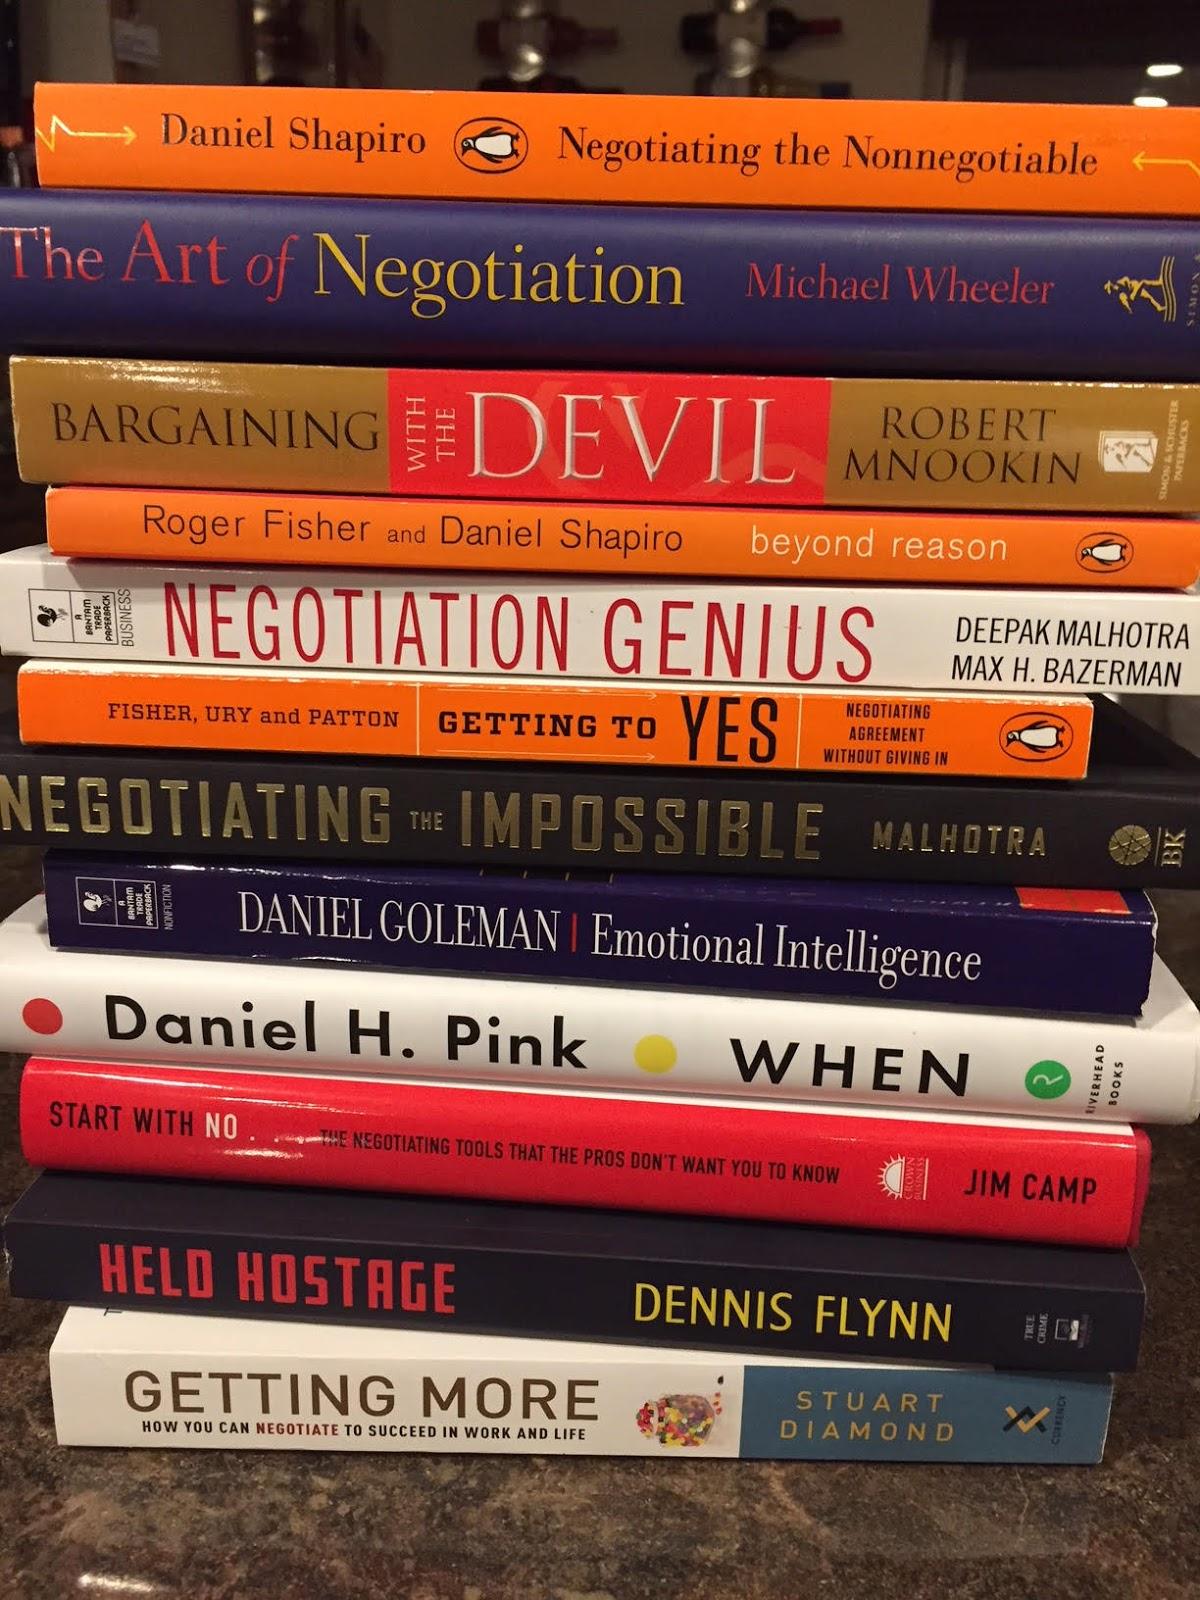 Hostage negotiation books